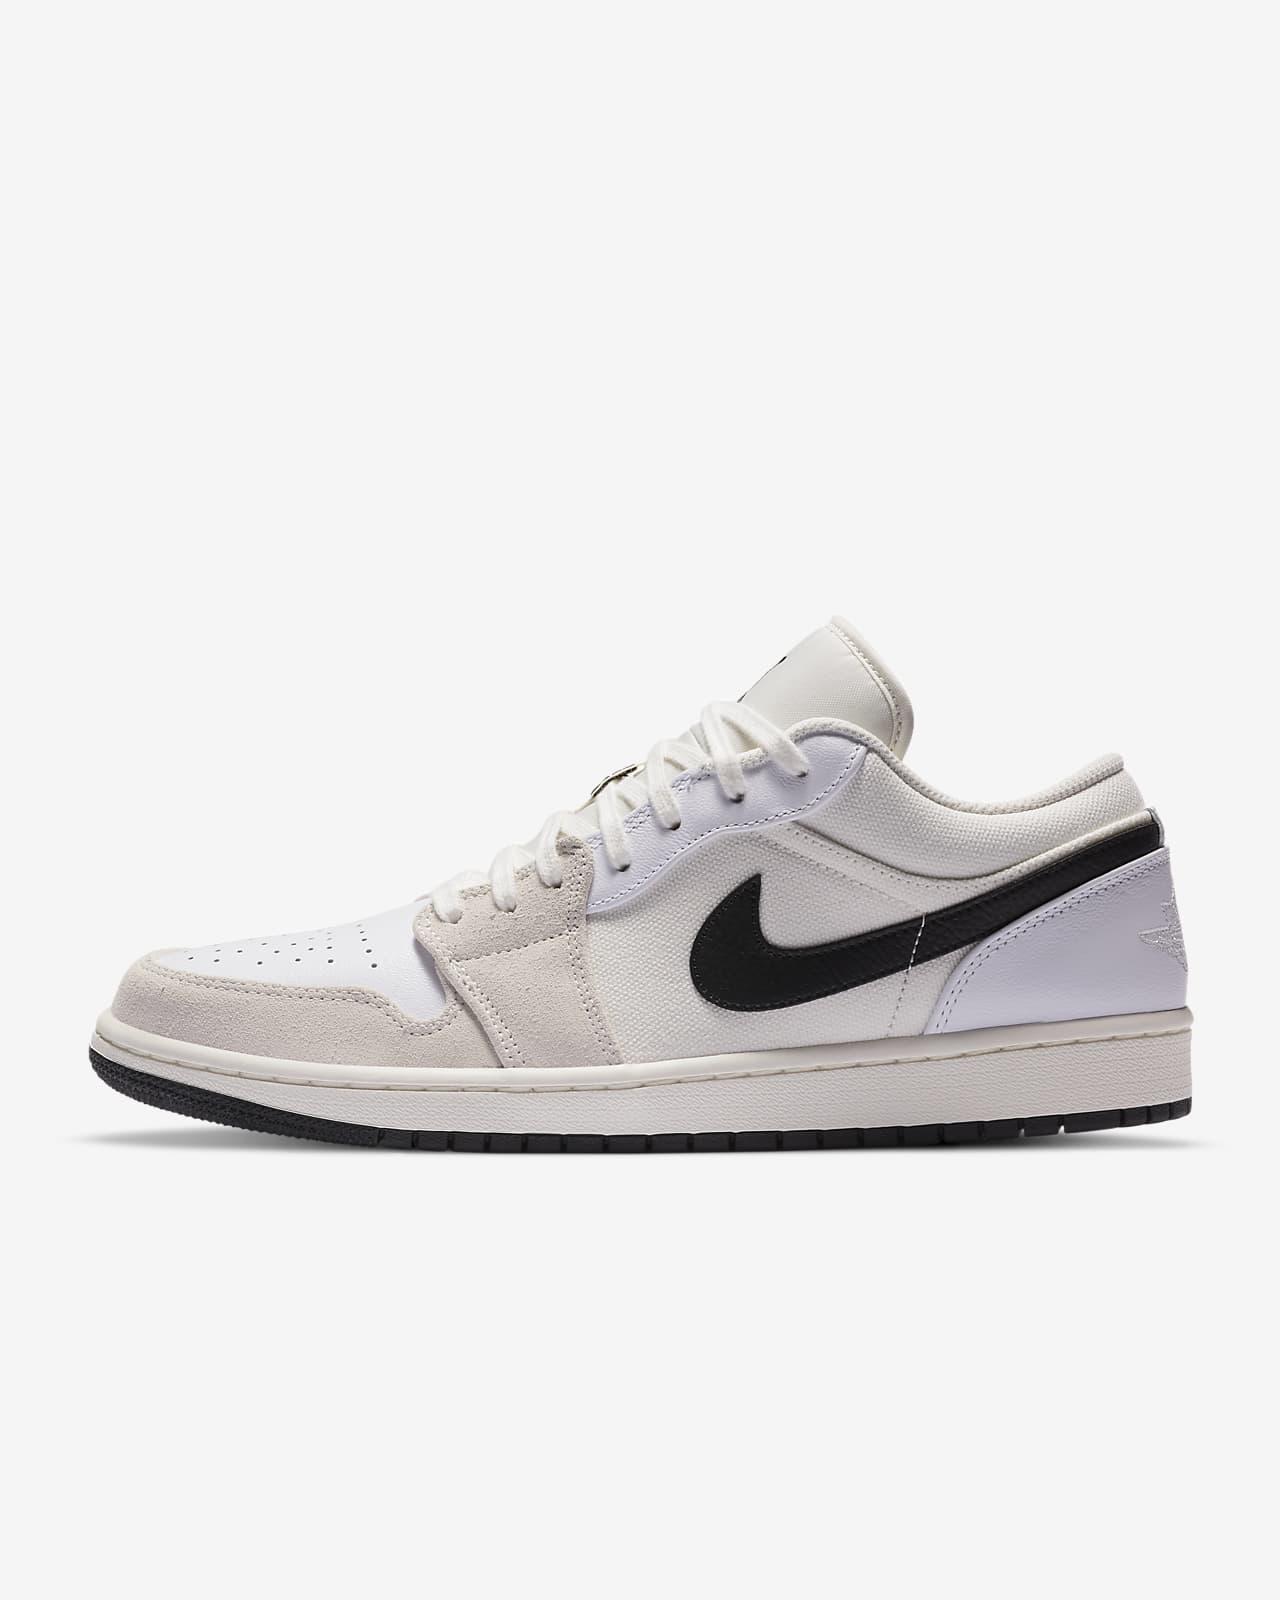 AJF,chaussures air jordan,nalan.com.sg